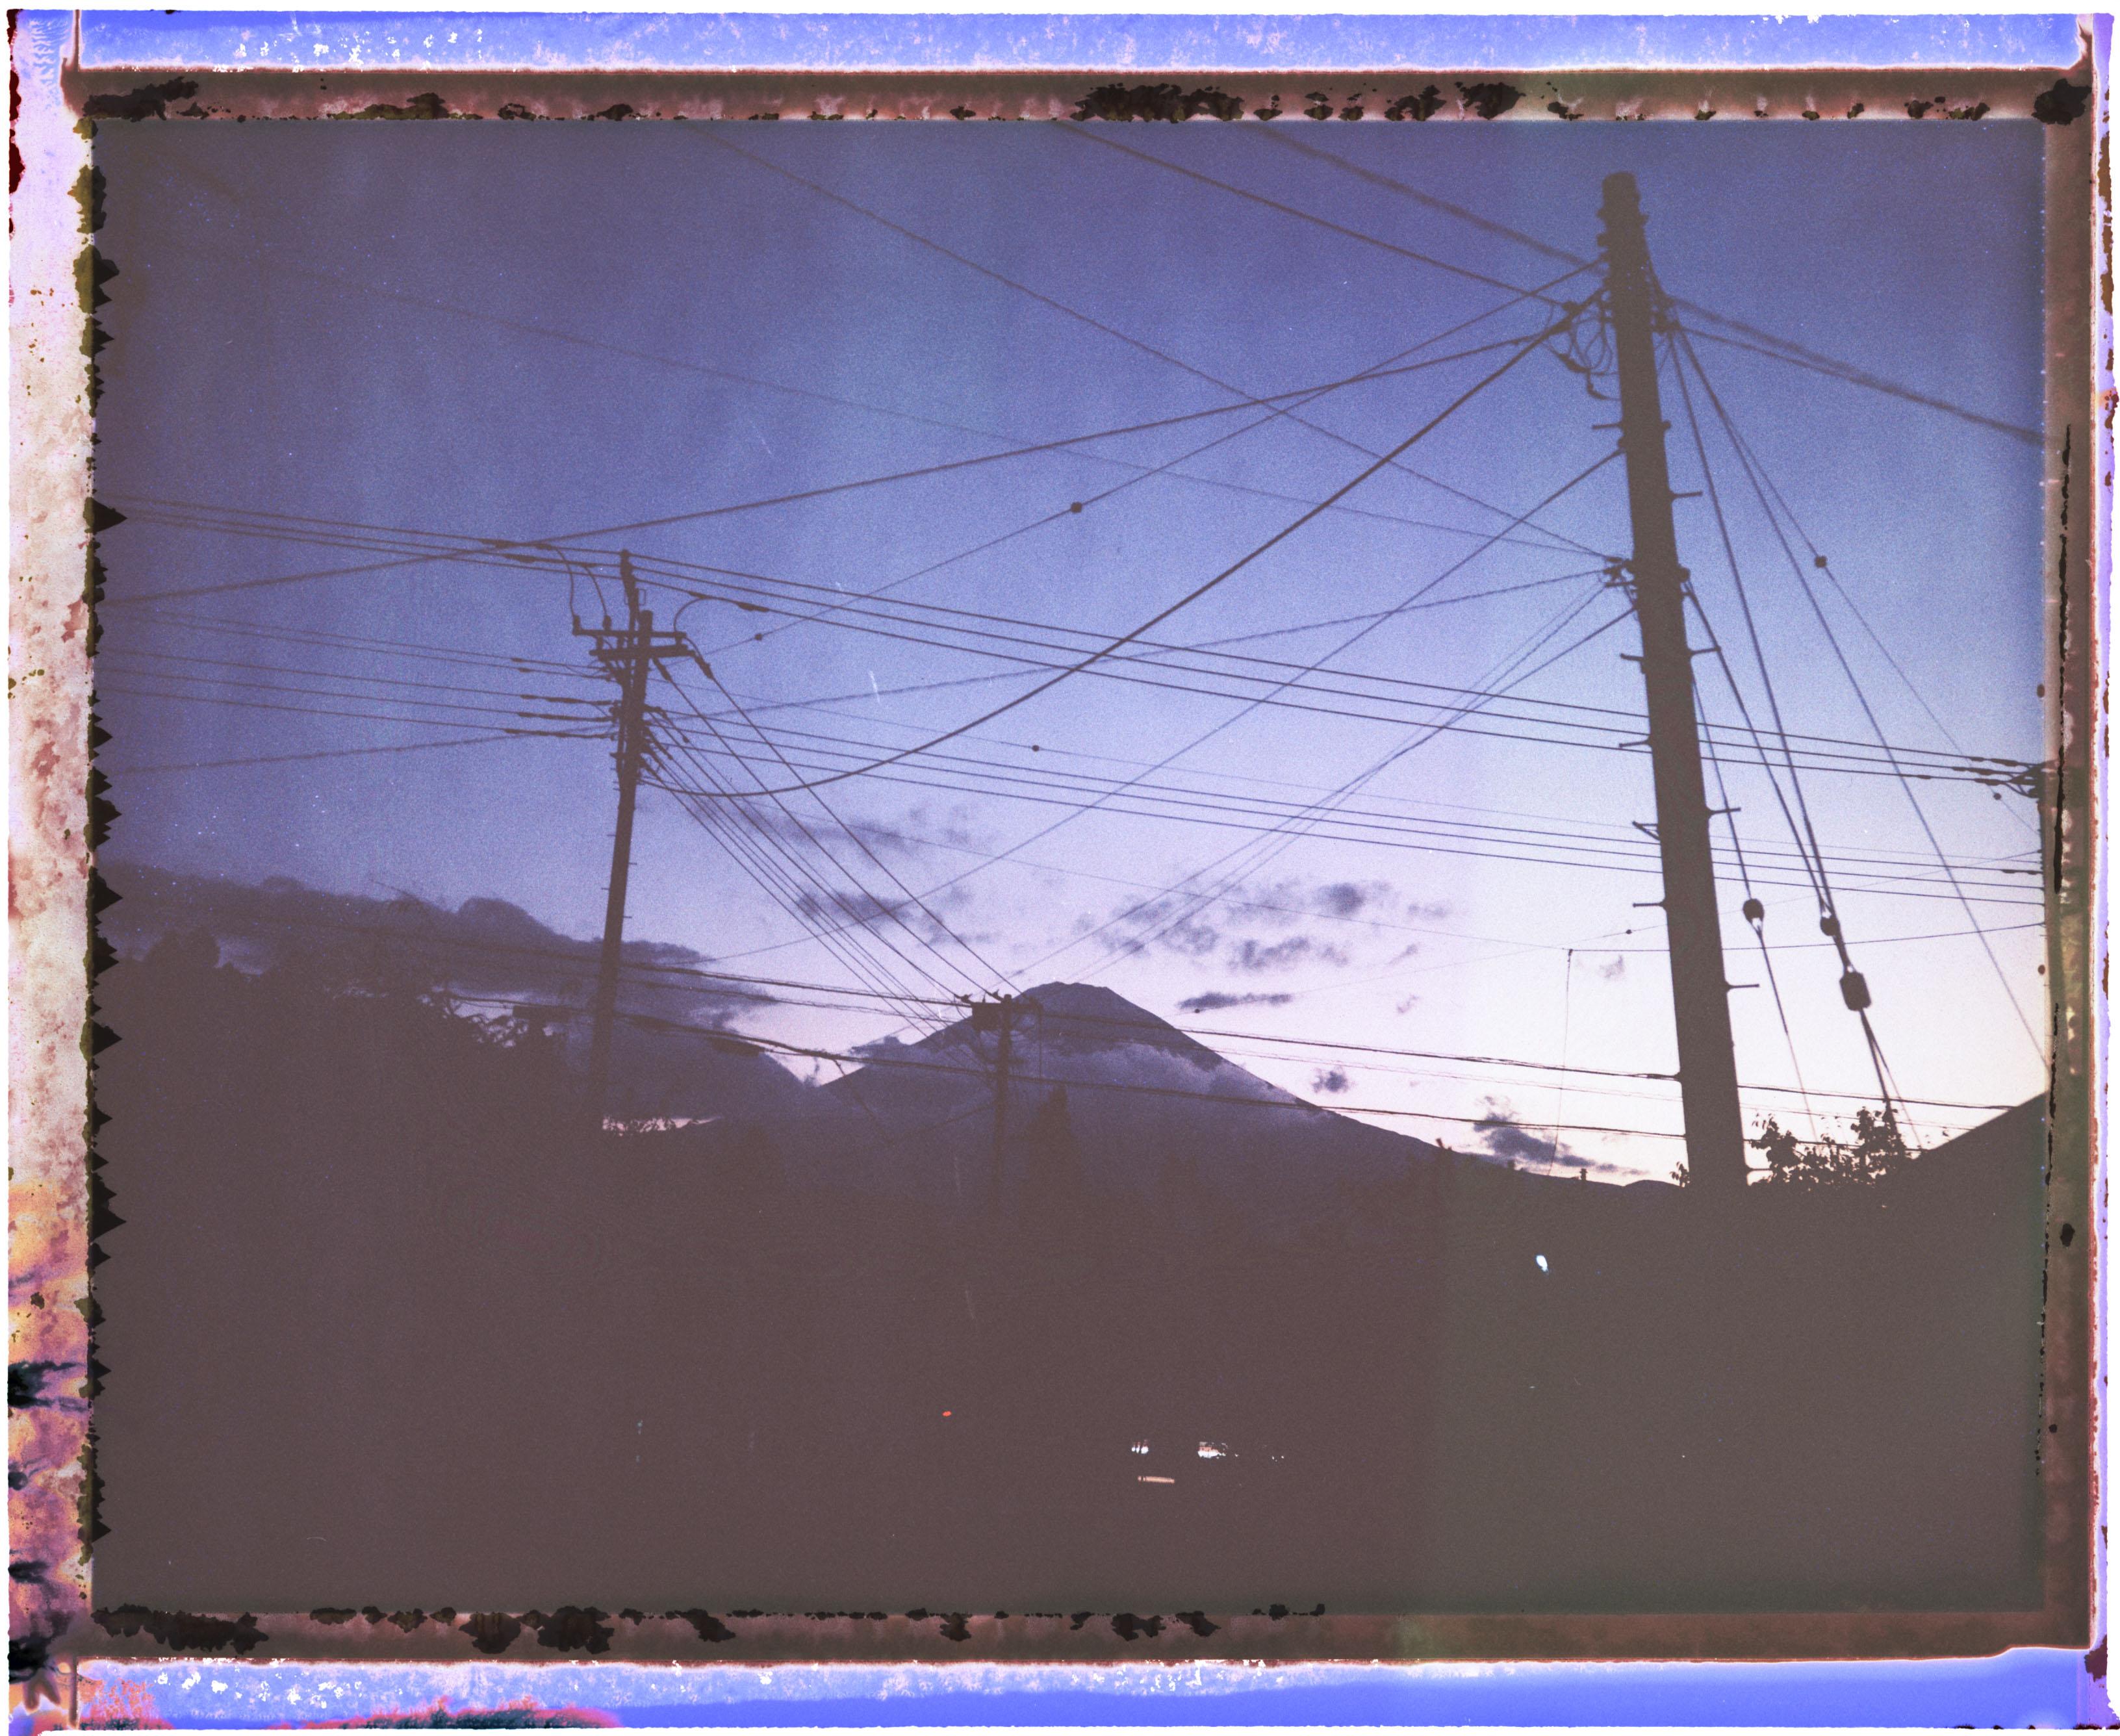 #019 Shizuoka